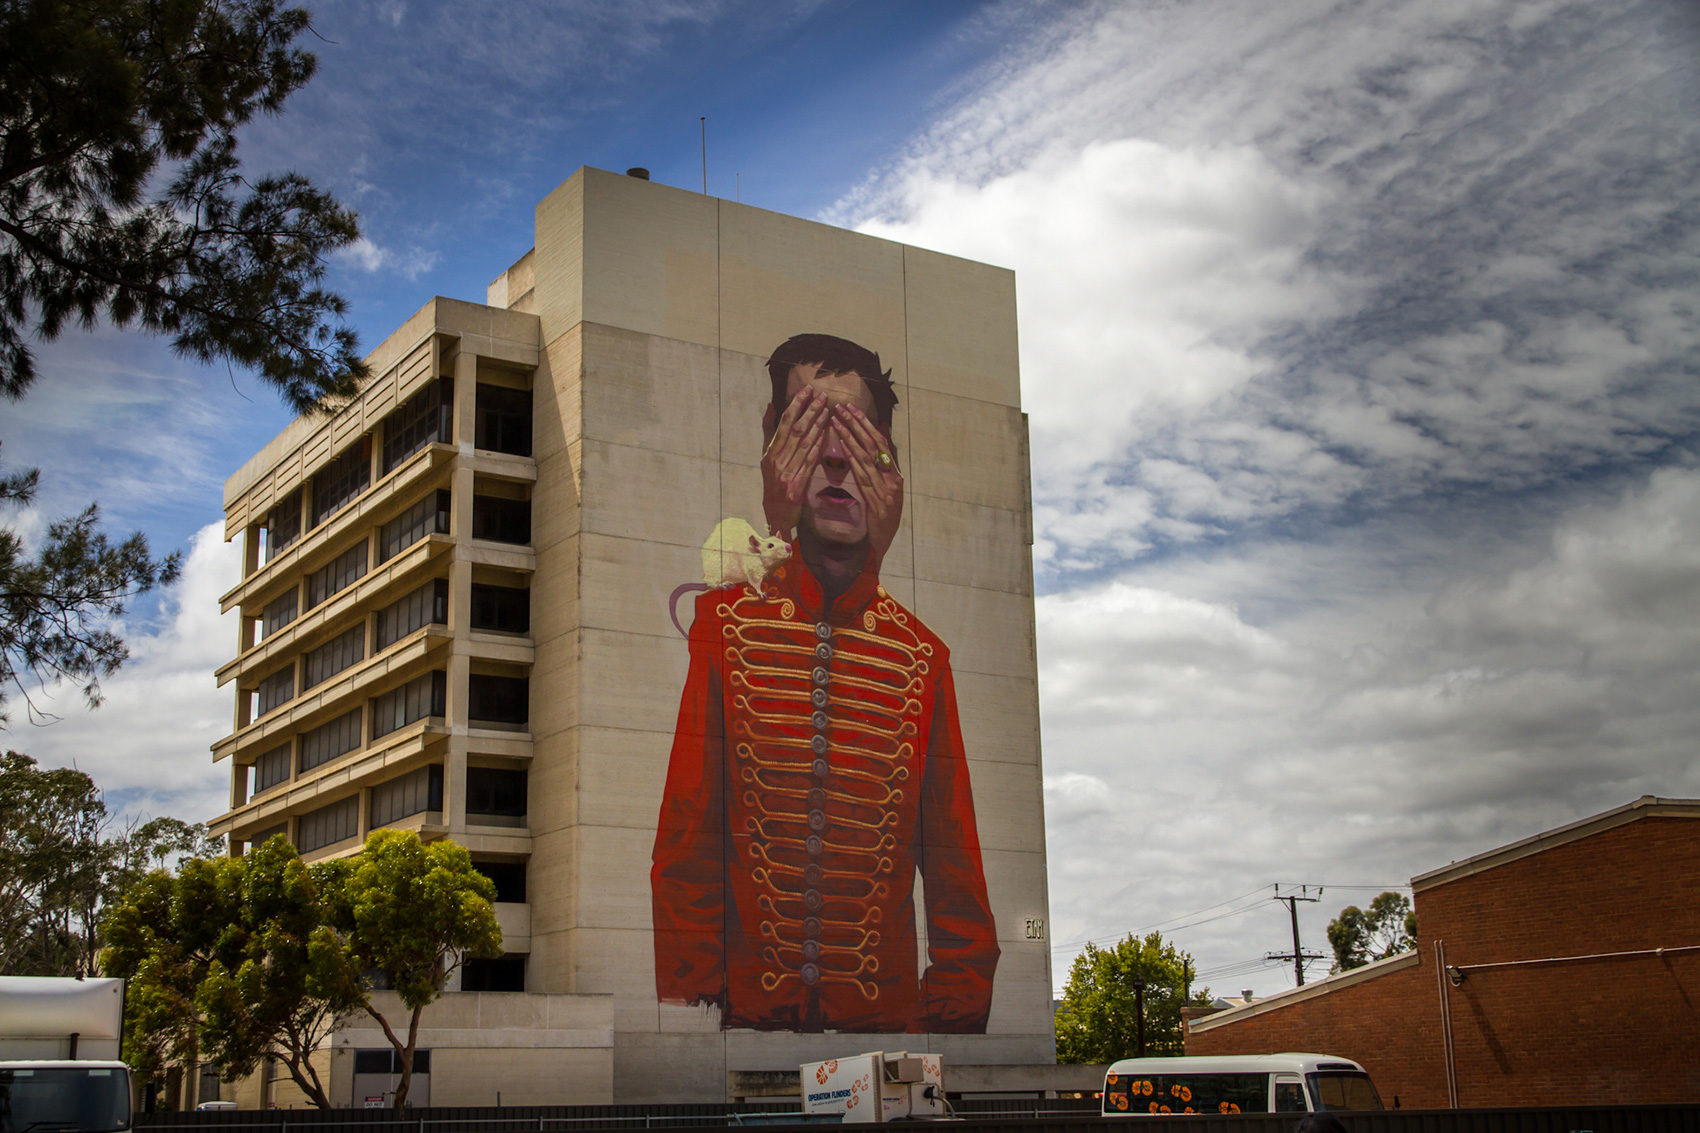 sainer_betz_etam_cru_wonderwalls_festival_adelaise_port_australia_walls_art_street_-8